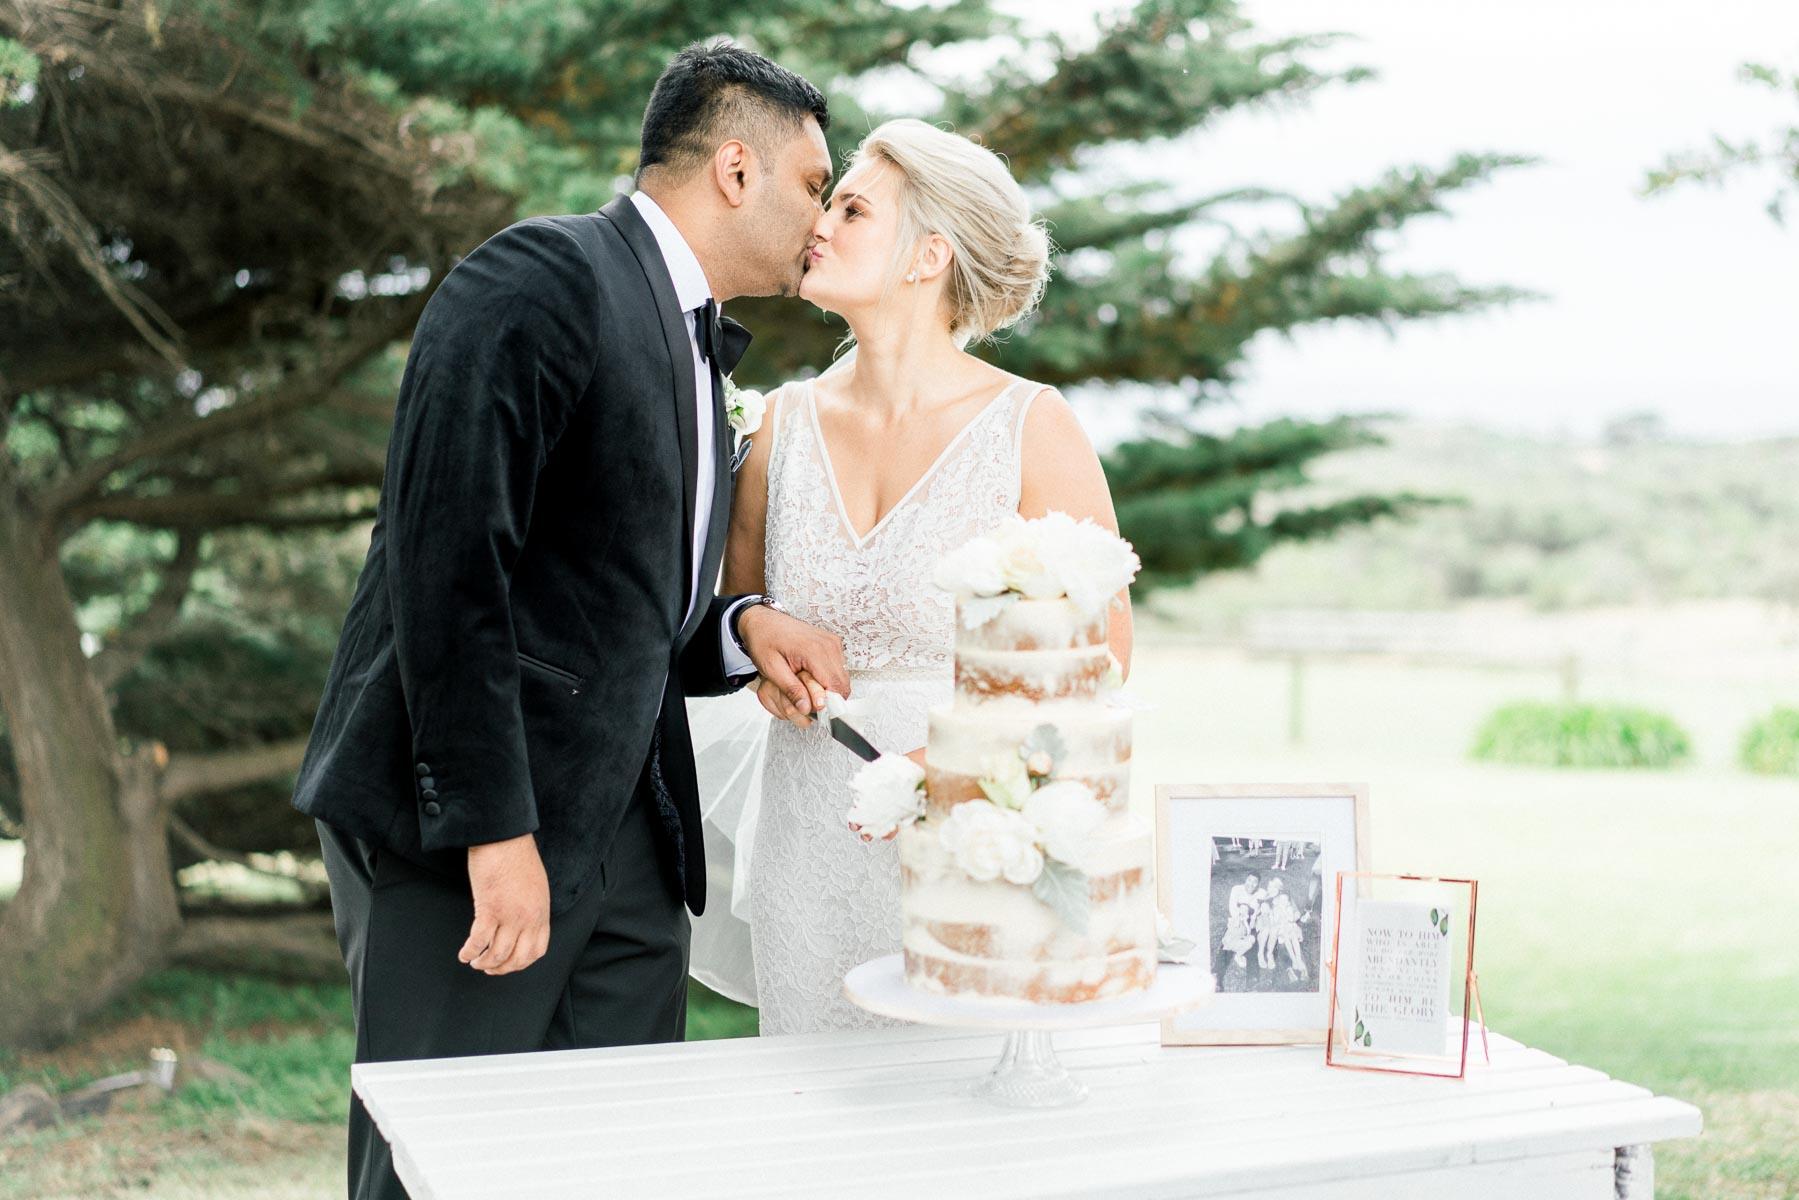 trenavin-chapel-phillip-island-wedding-heart+soul-weddings-sally-sean-00517.jpg